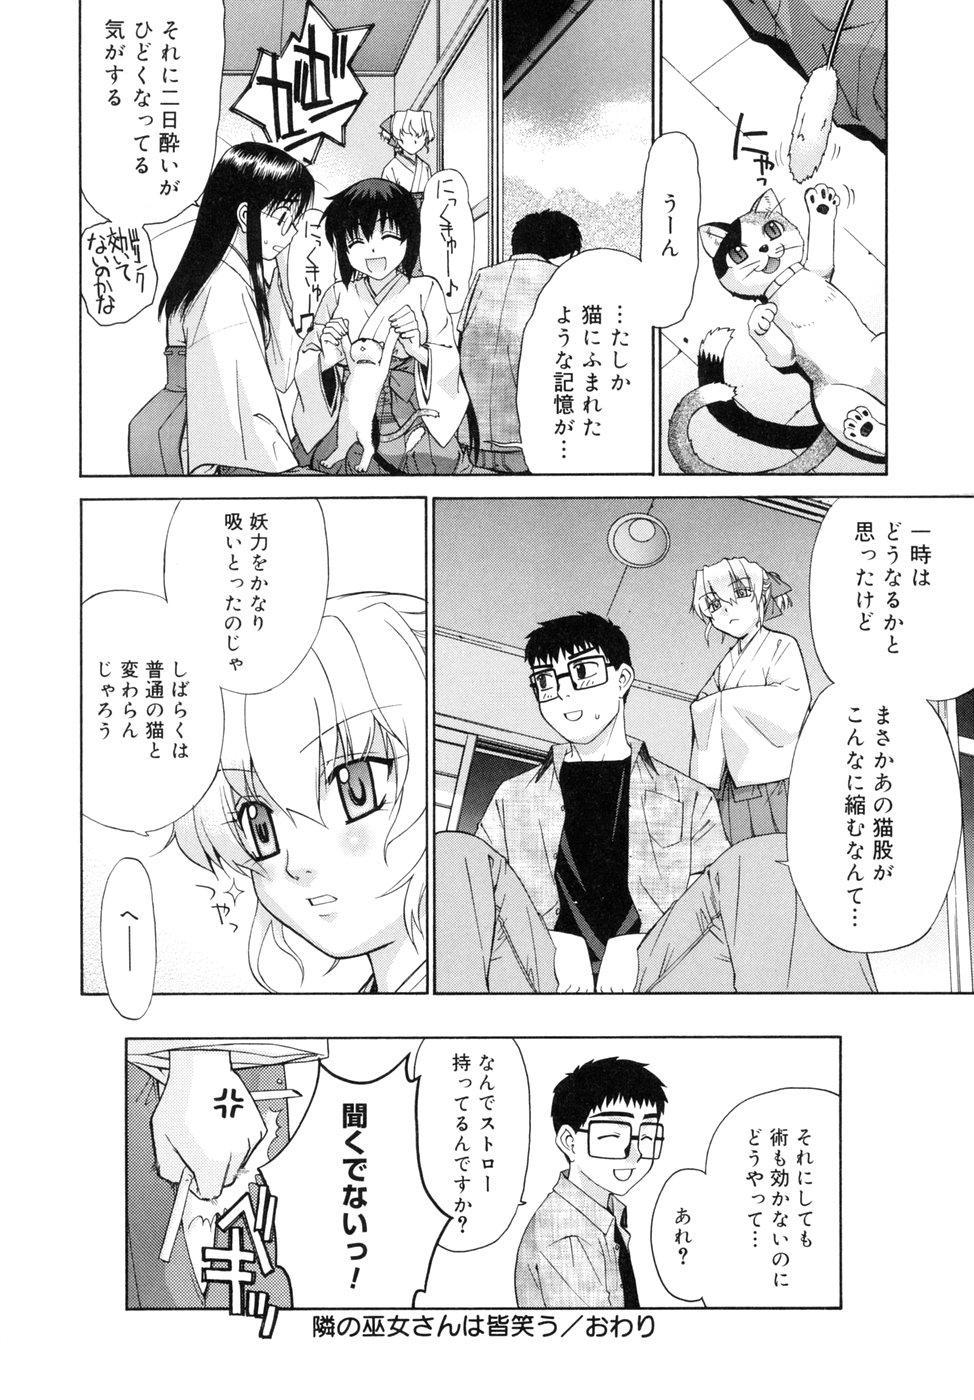 [Yaya Hinata] Tonari no Miko-san wa Minna Warau - The next shrine maidens smile in everyone. 181